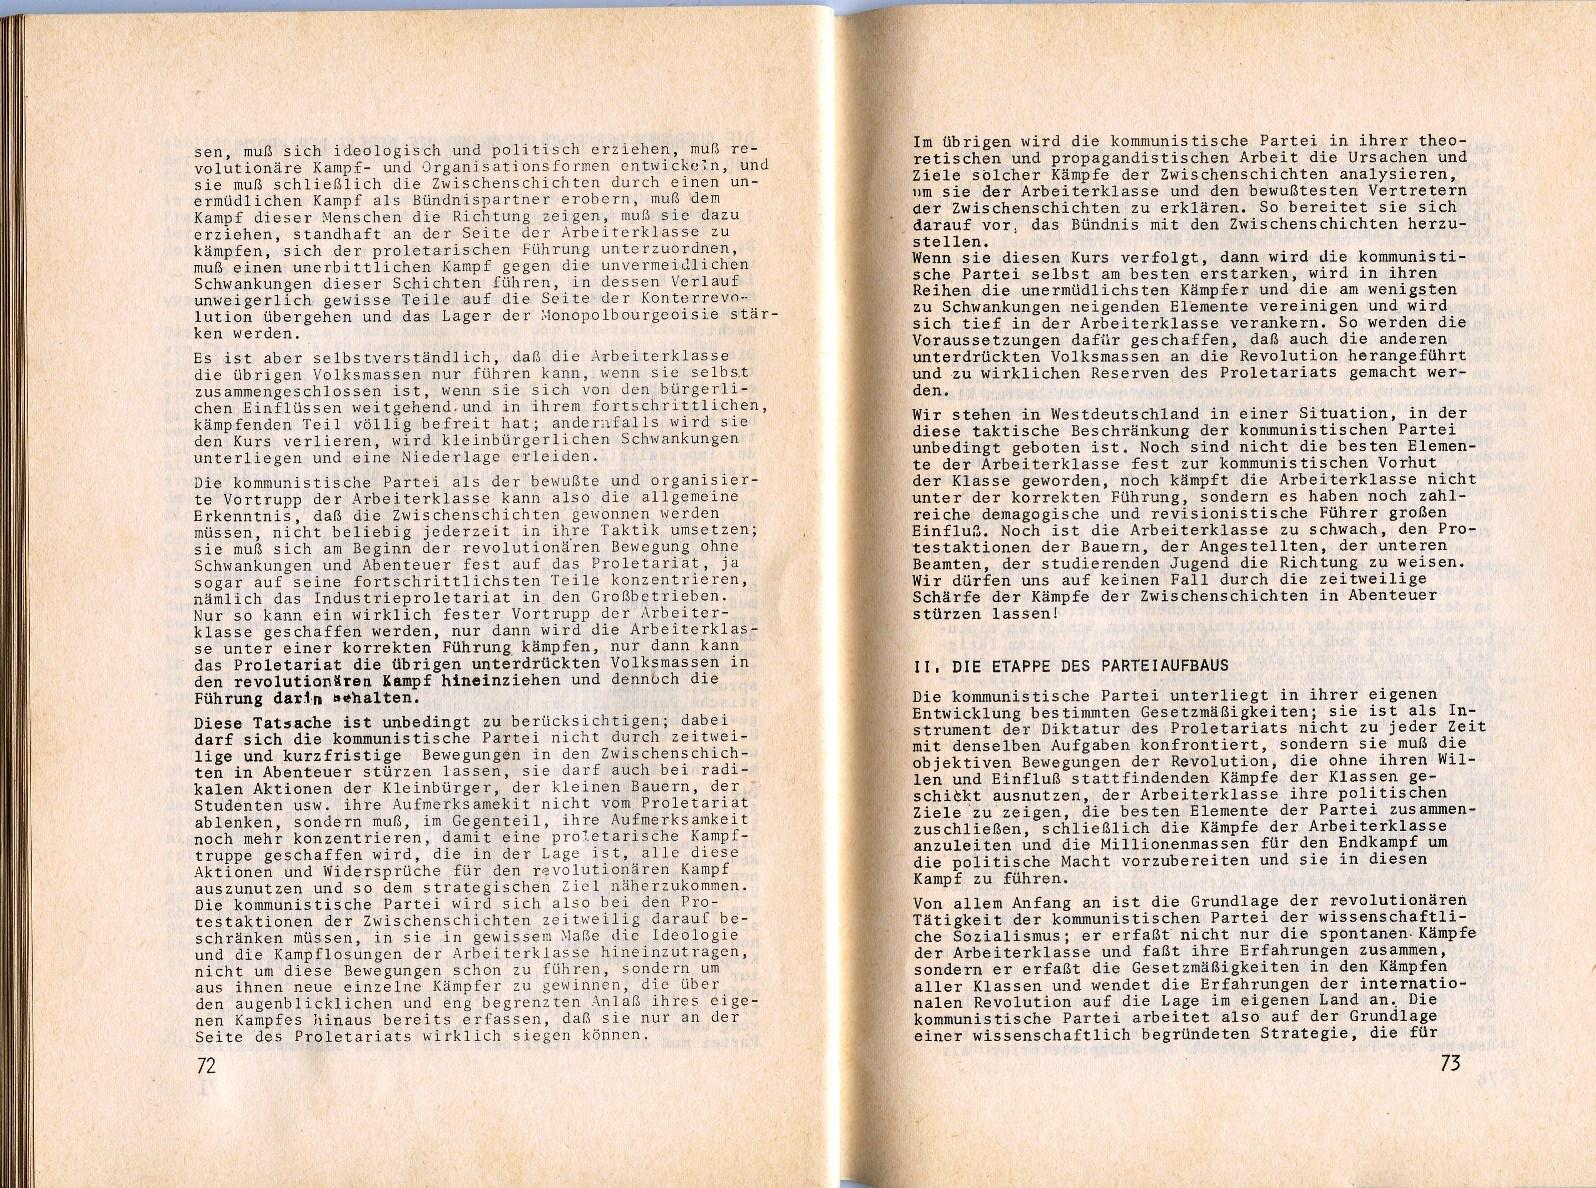 ZB_Parteiarbeiter_1971_07_38